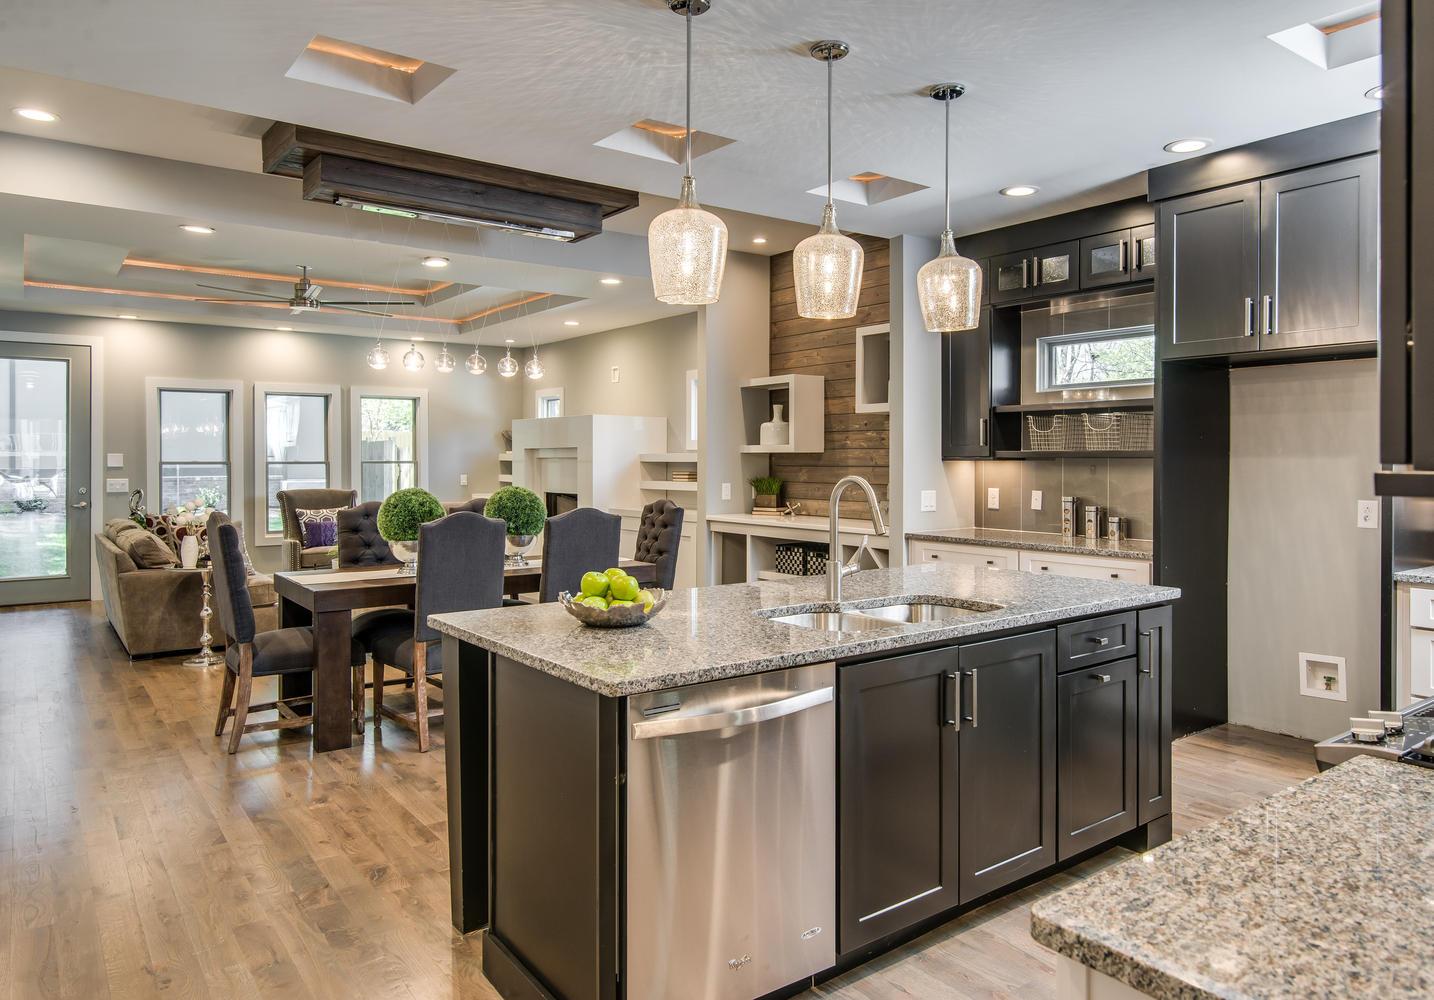 House-Plans-Online-Duplex-Nashville-Peggy-Newman-Kitchen-Family-1613.jpg